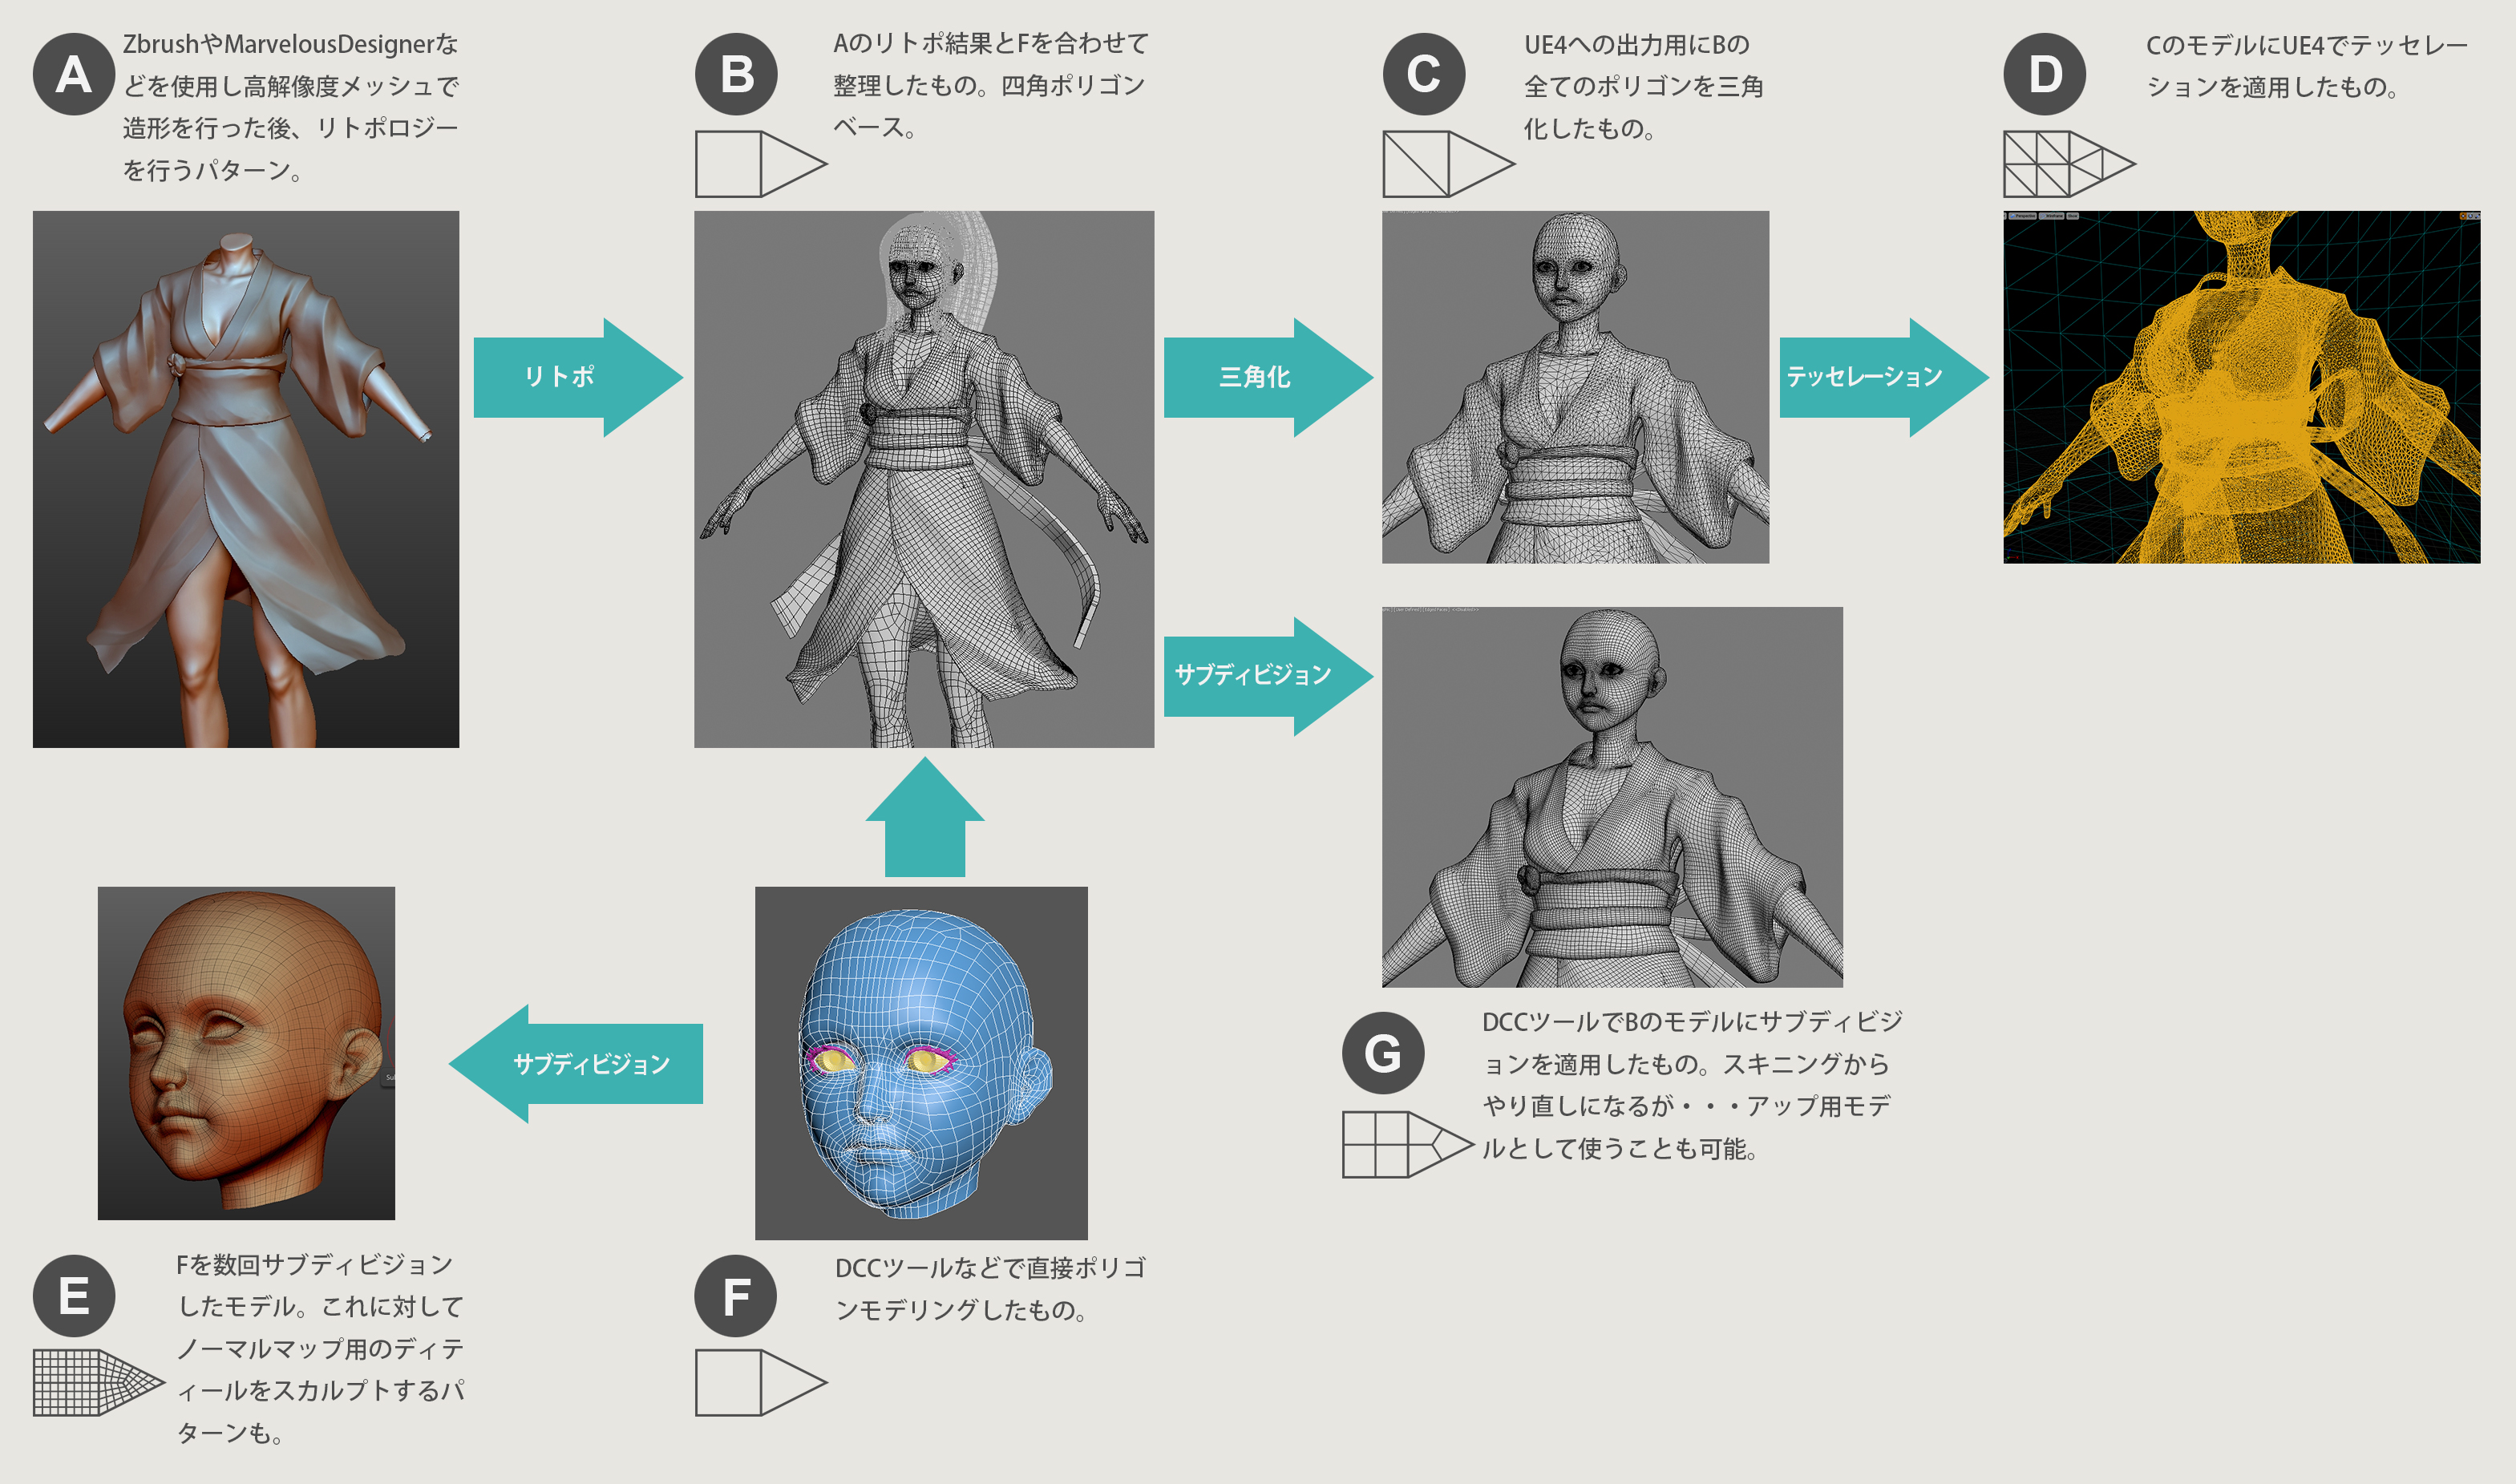 fig02_CharacterModelingFlow.jpg